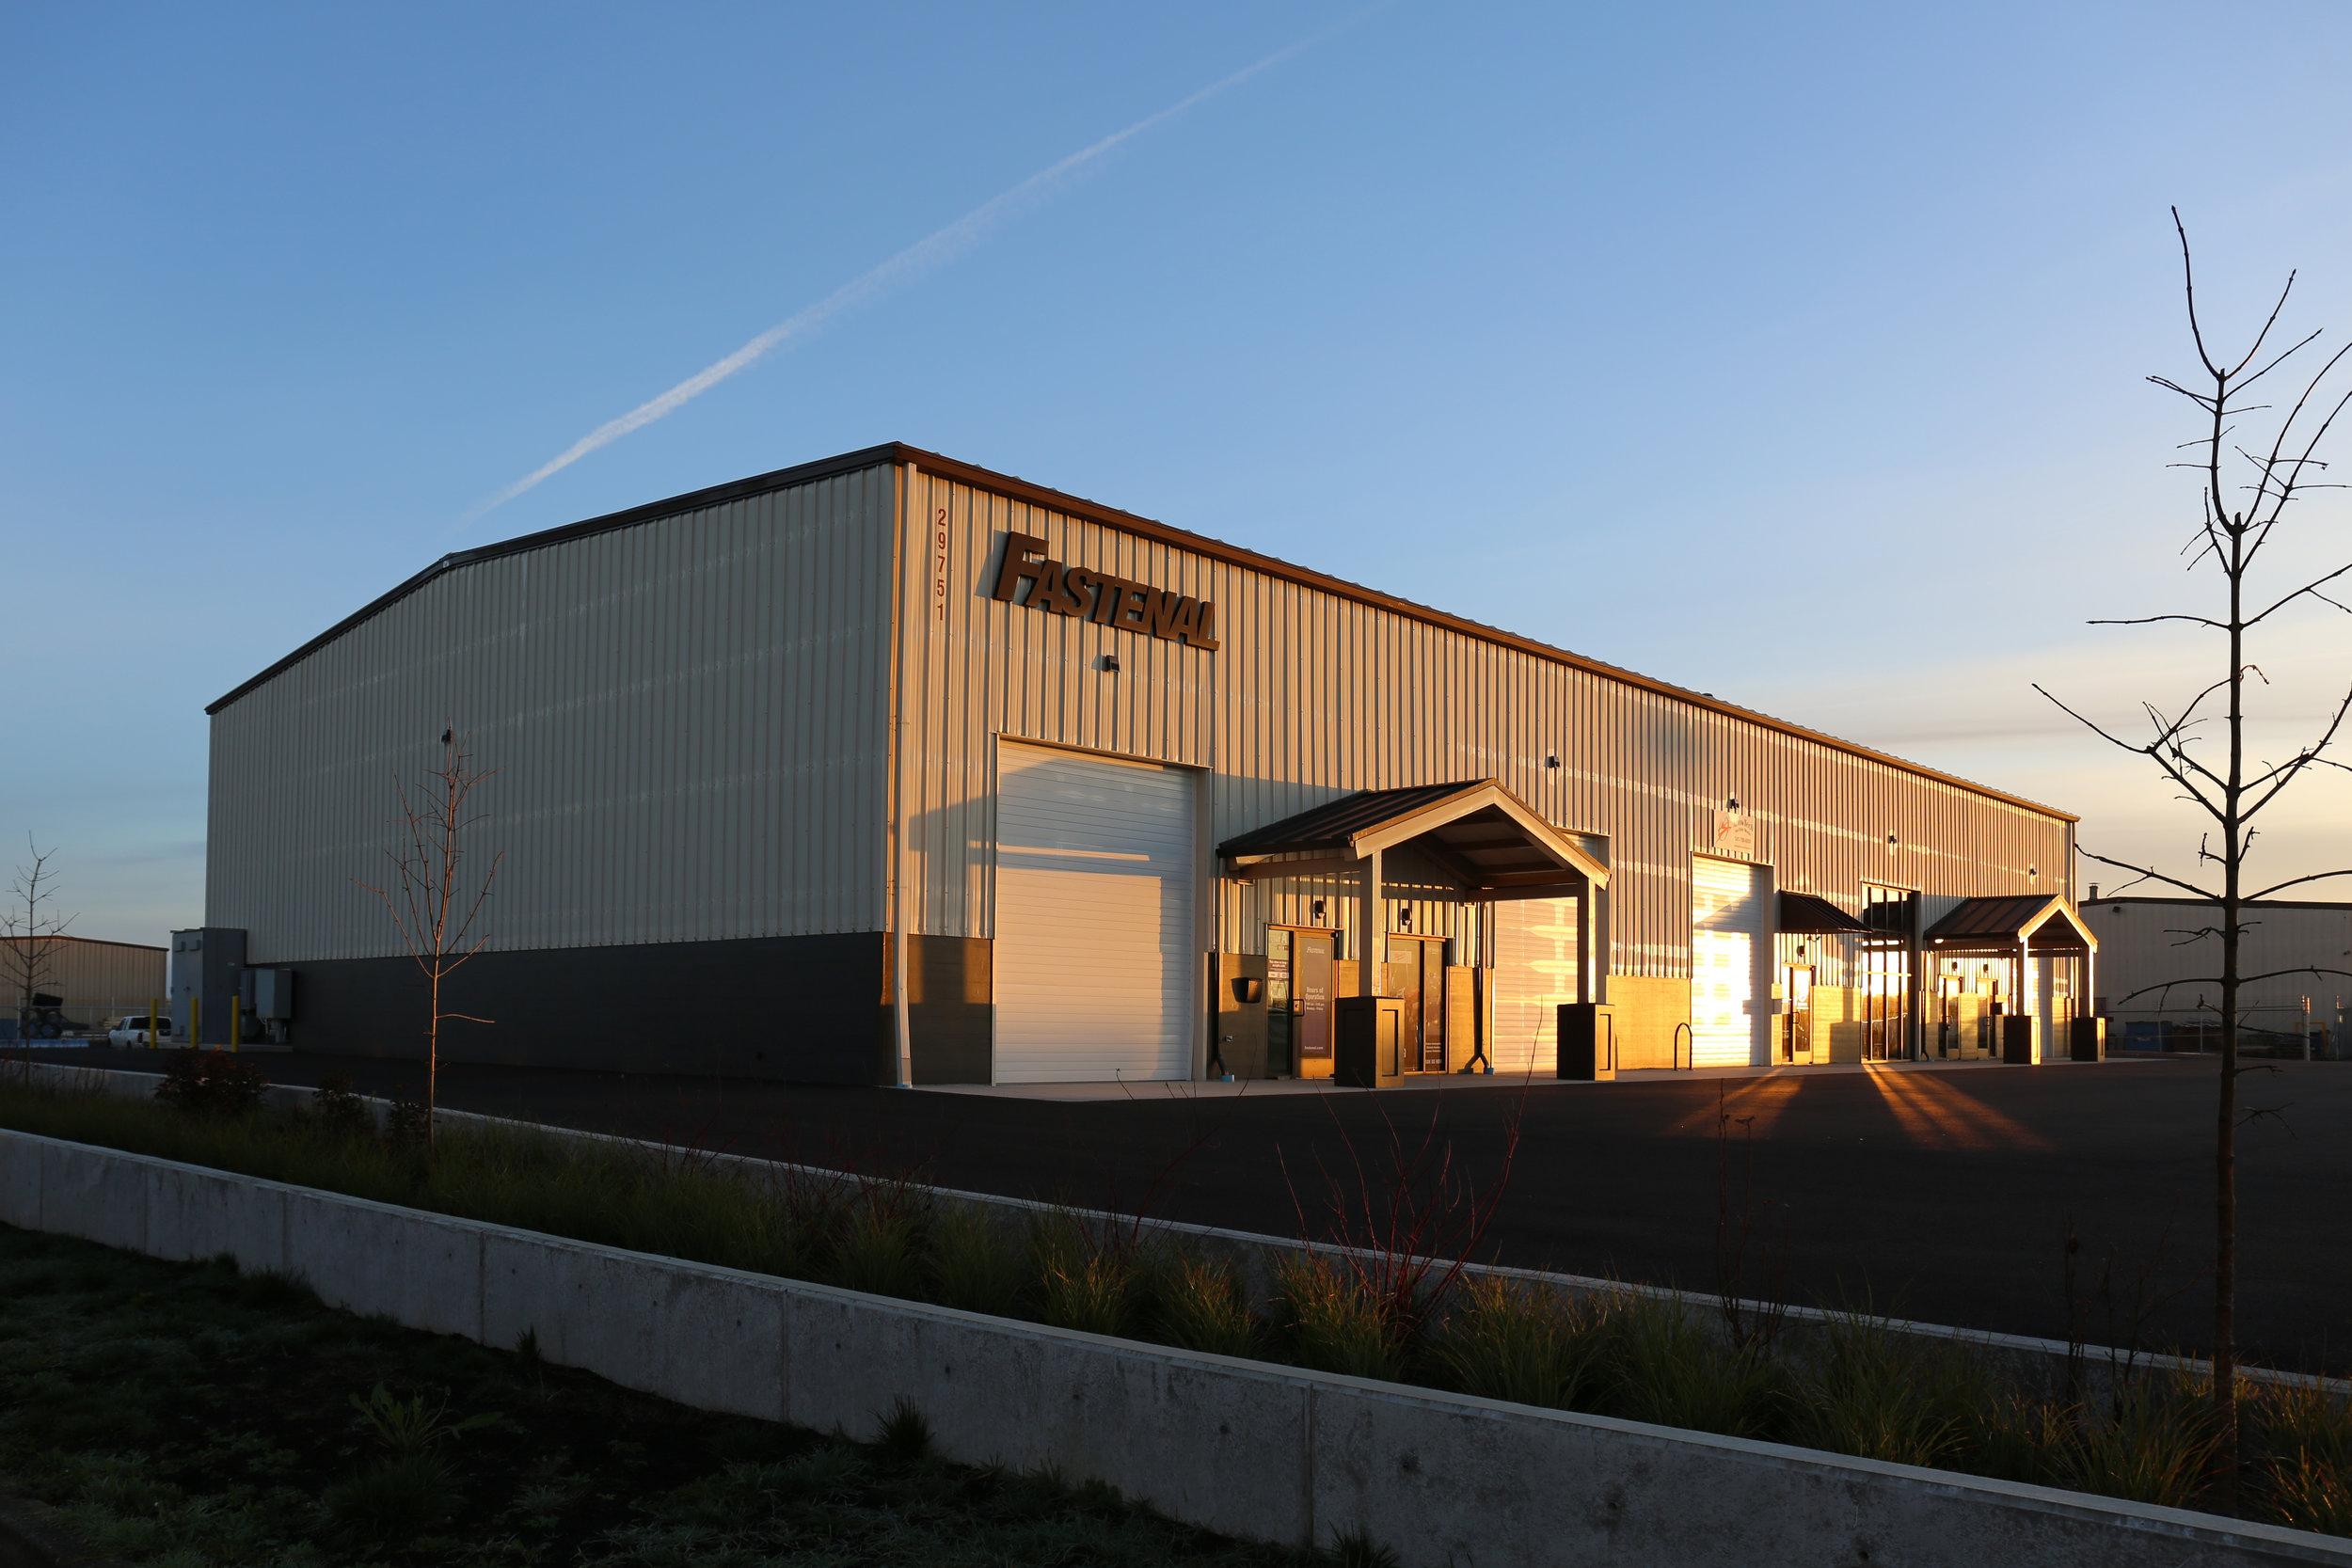 Woodruff Building